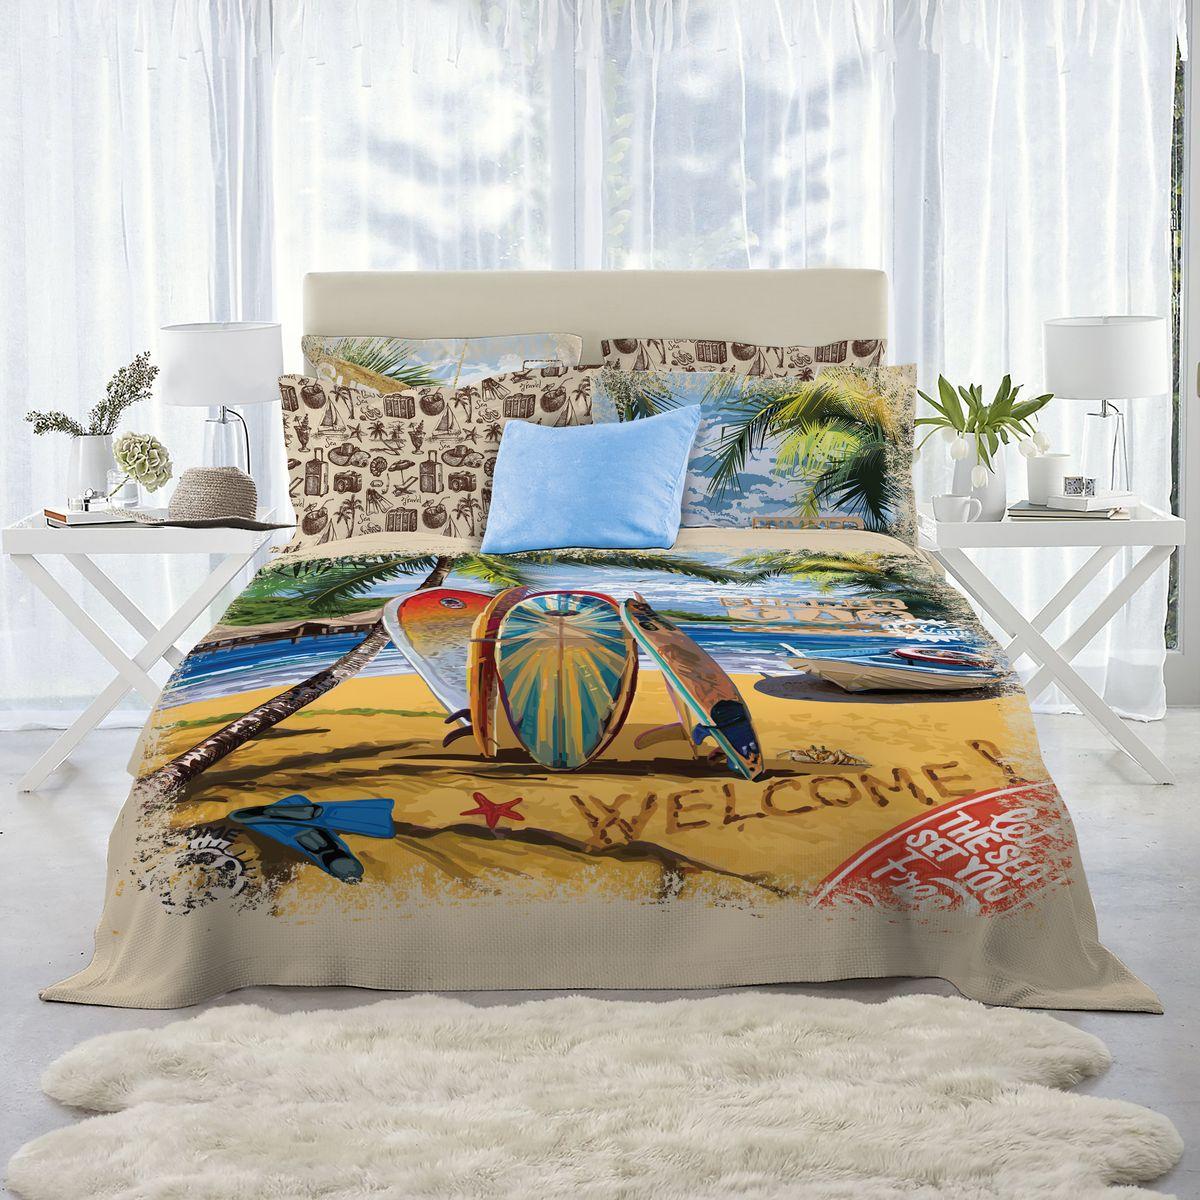 Комплект белья Mona Liza Surf, 2-спальный, наволочки 50х70, 70х70 mona liza mona liza полотенце 70 140 summer surf